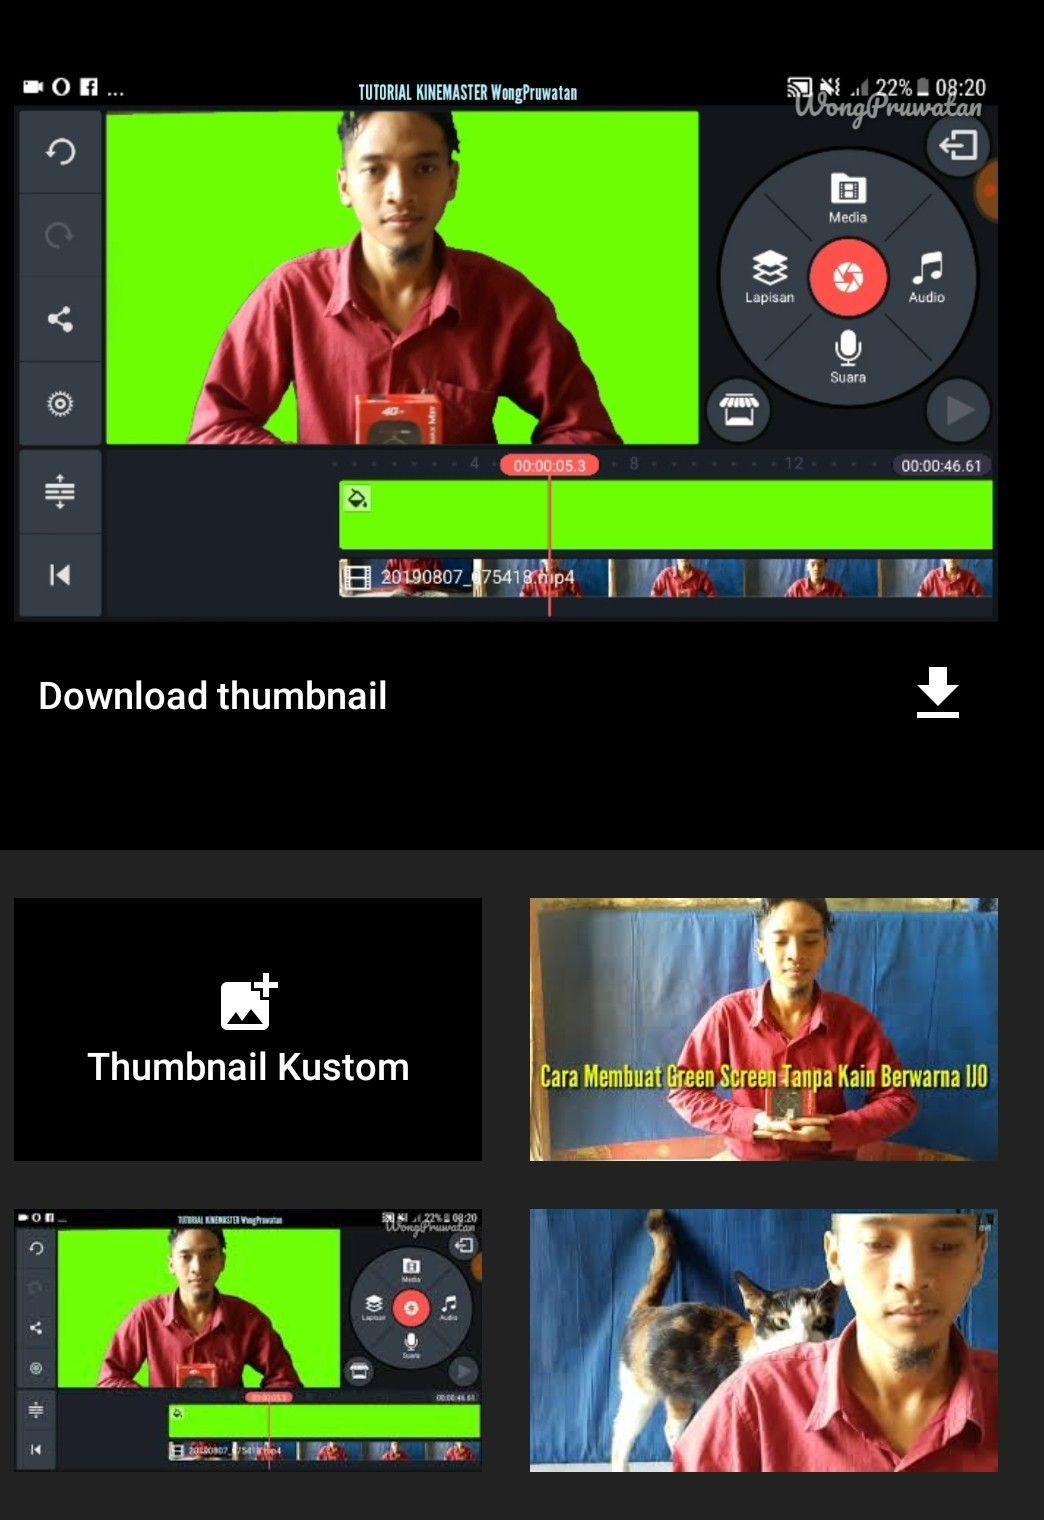 Cara Bikin Green Screen Tanpa Kain Hijau Hijau Warna Video